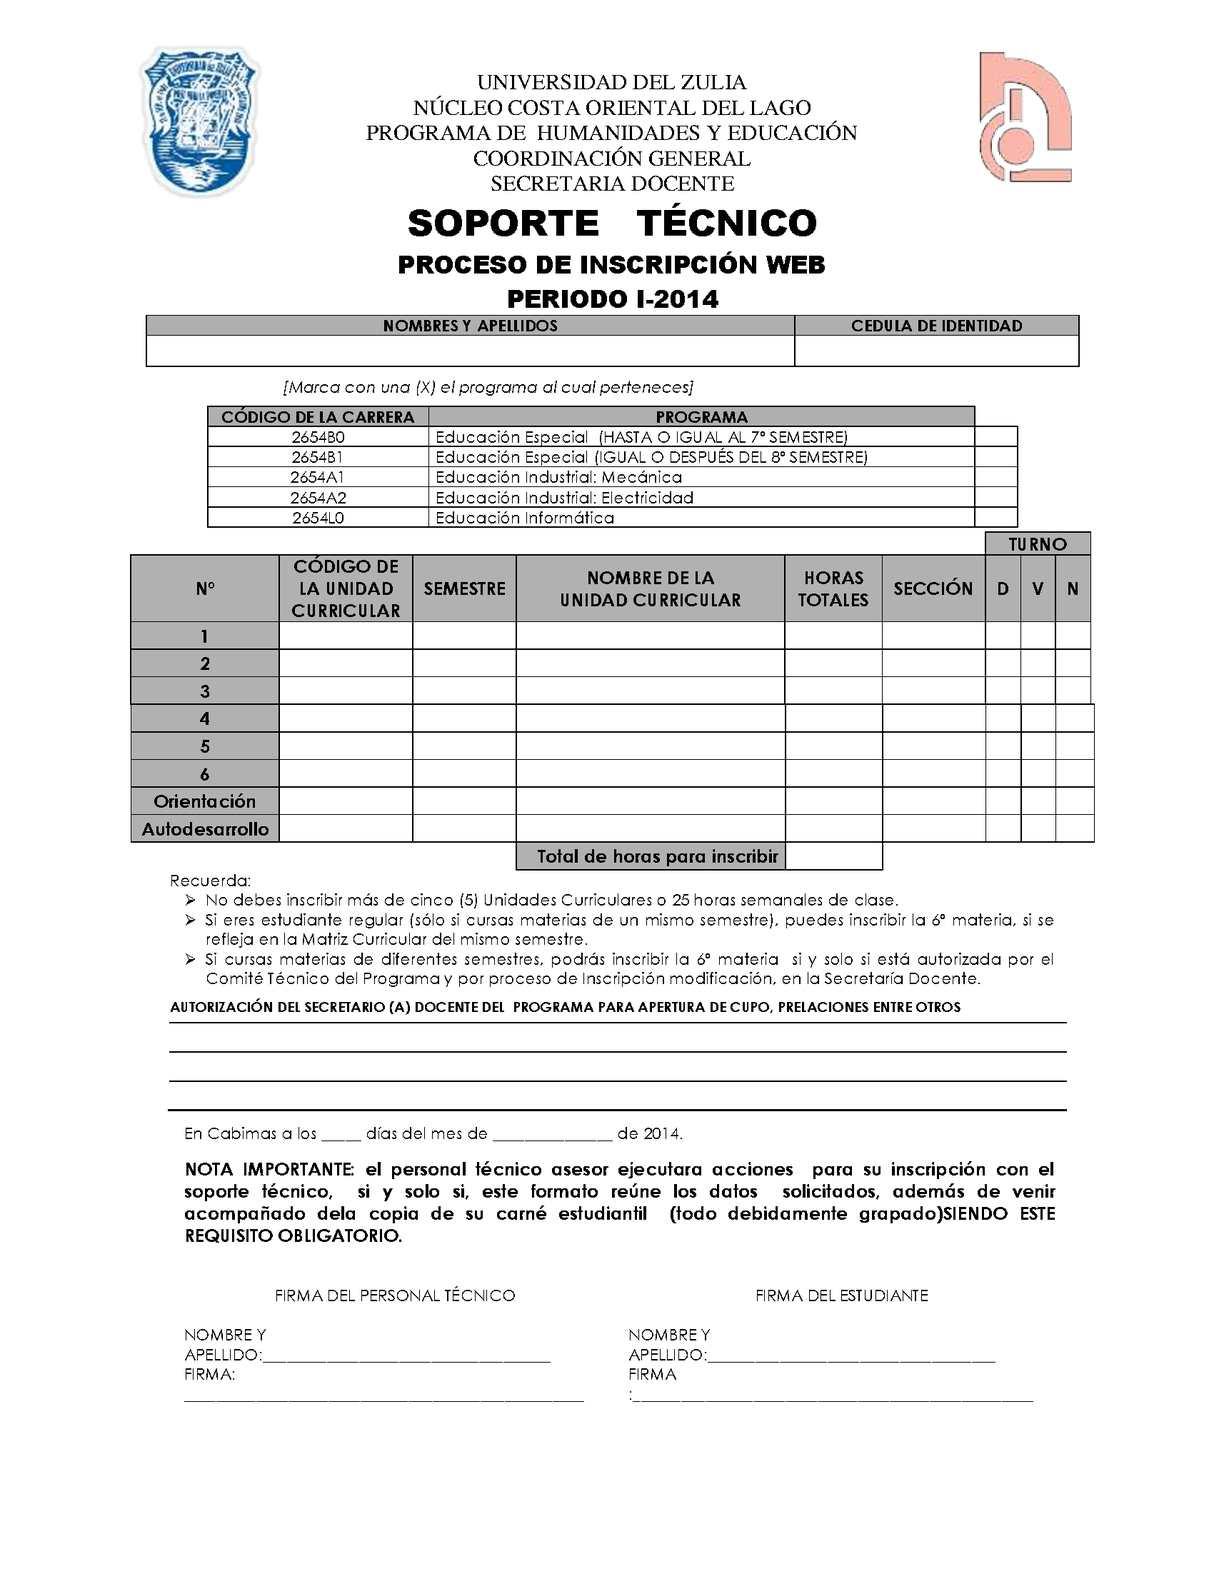 Calaméo - SOPORTE TÉCNICO I 2014